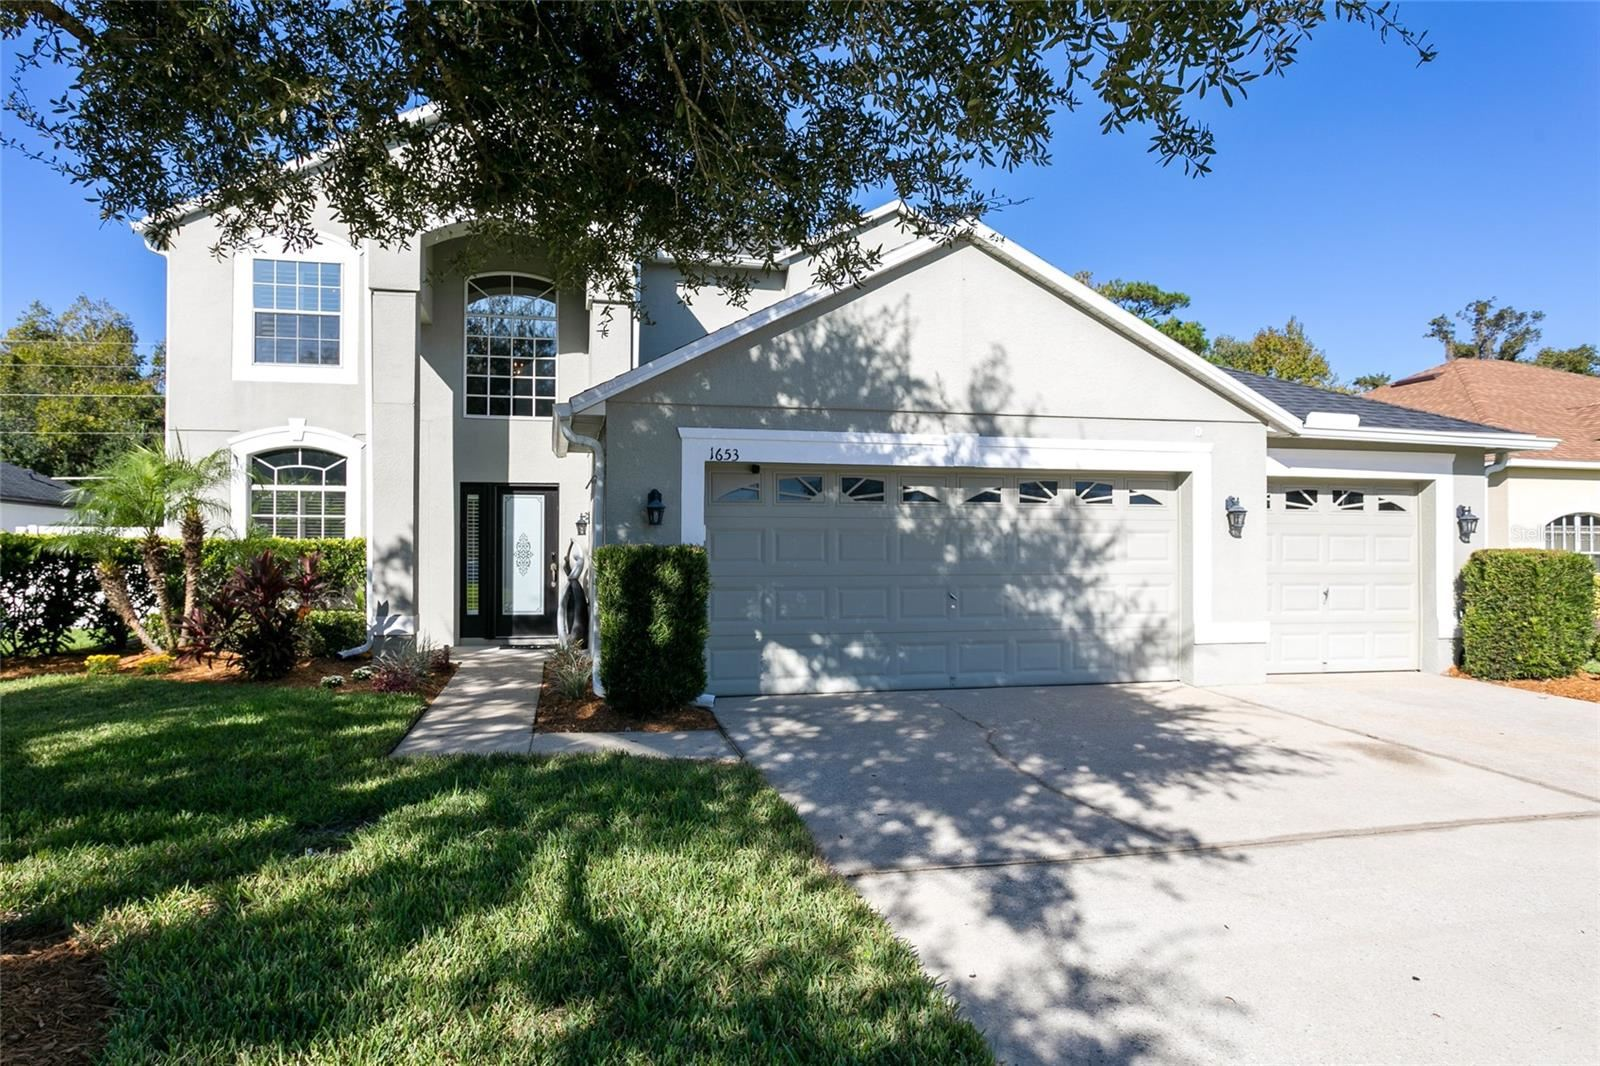 1653 SILK TREE CIRCLE, Sanford, FL 32773 - #: O5980927